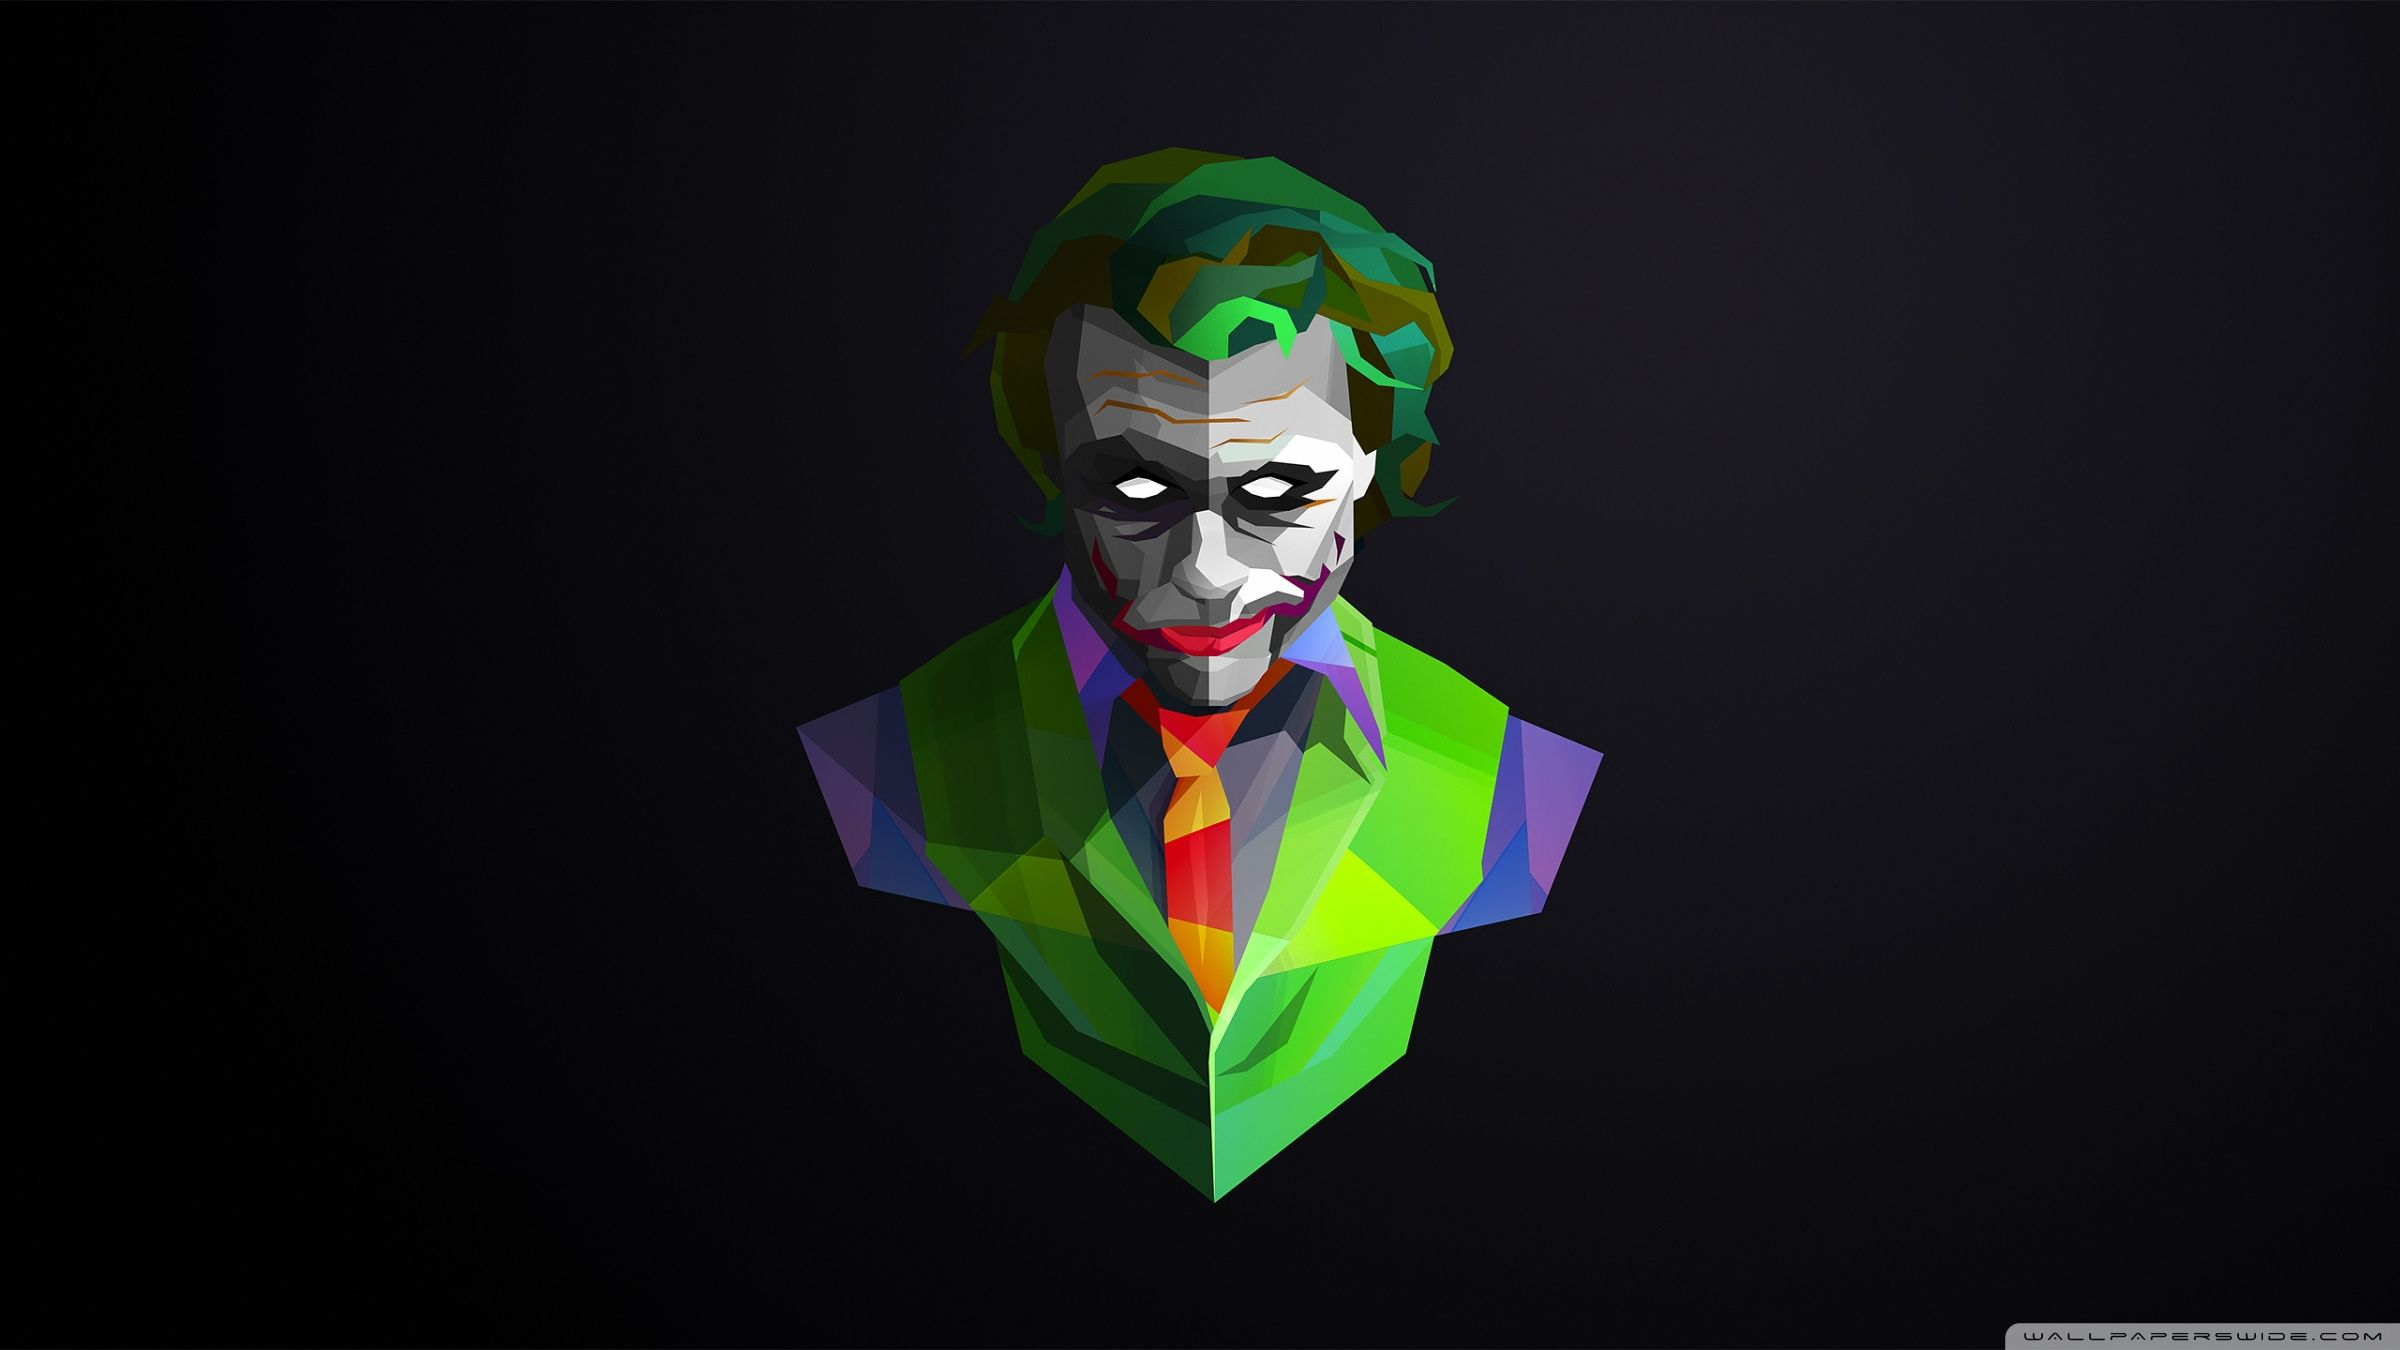 Funny Joker Wallpapers Top Free Funny Joker Backgrounds Wallpaperaccess